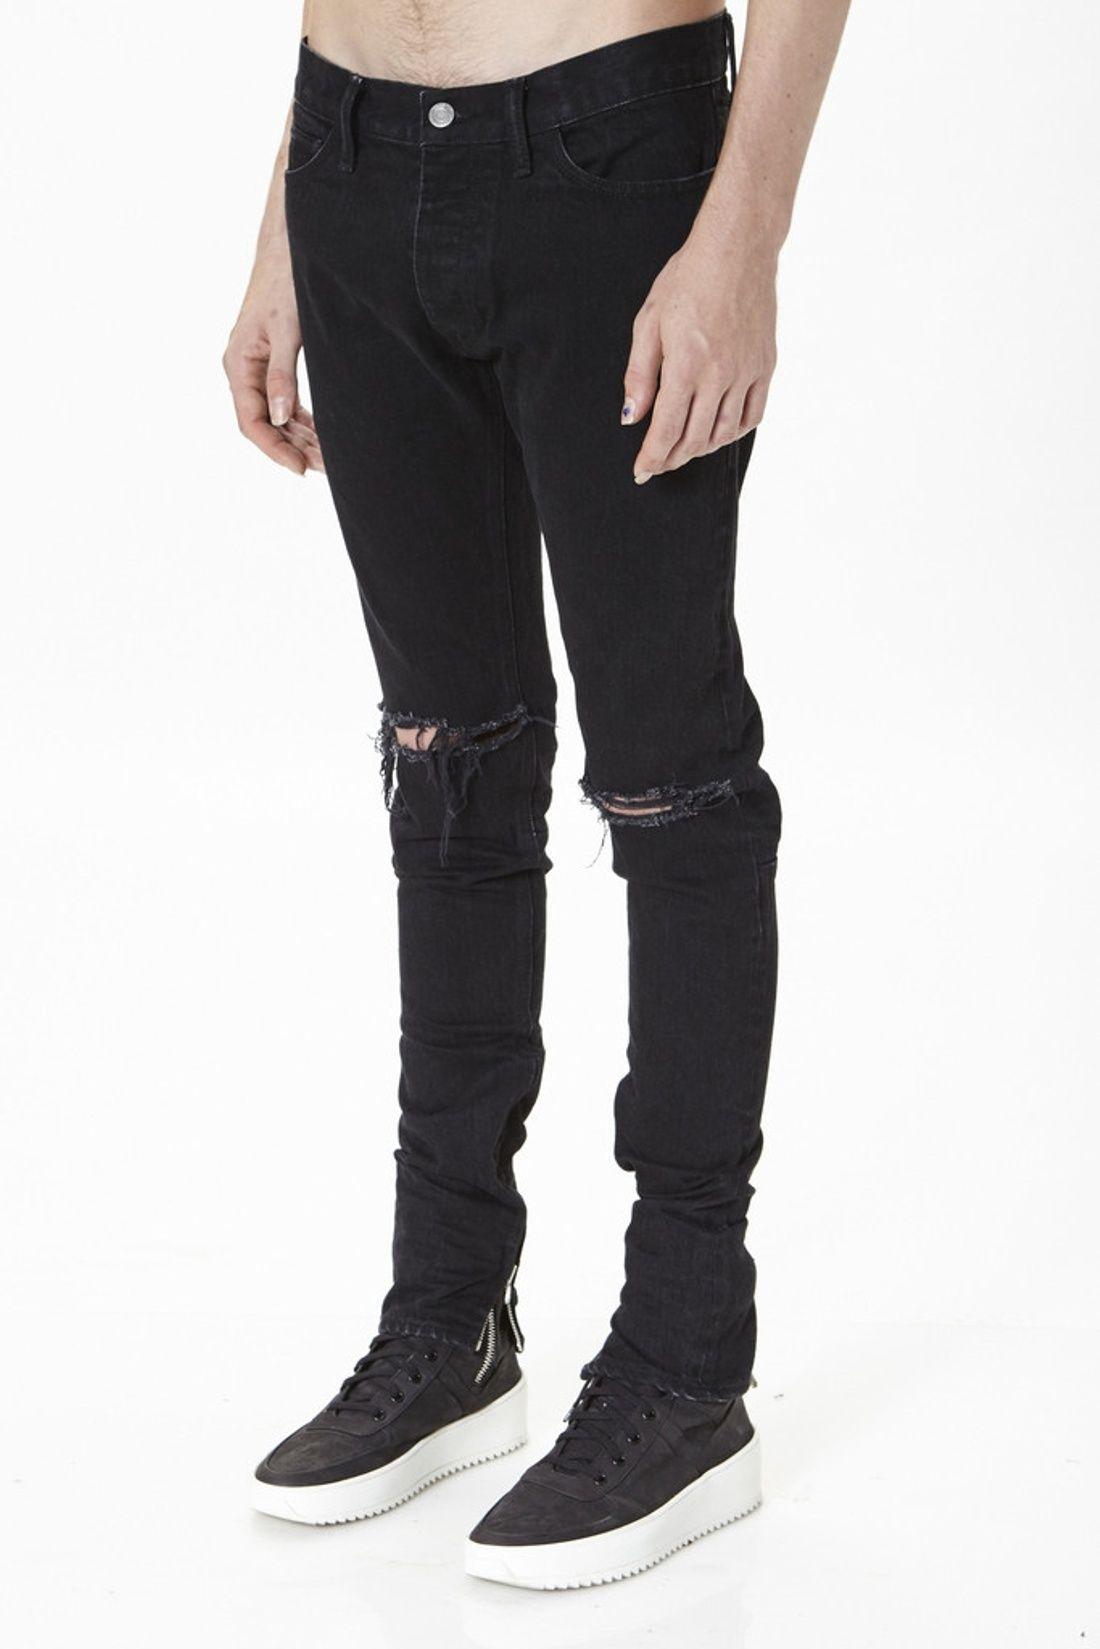 Fear Of God Black Selvedge Denim Size 32 650 Black Selvedge Denim Black Jeans